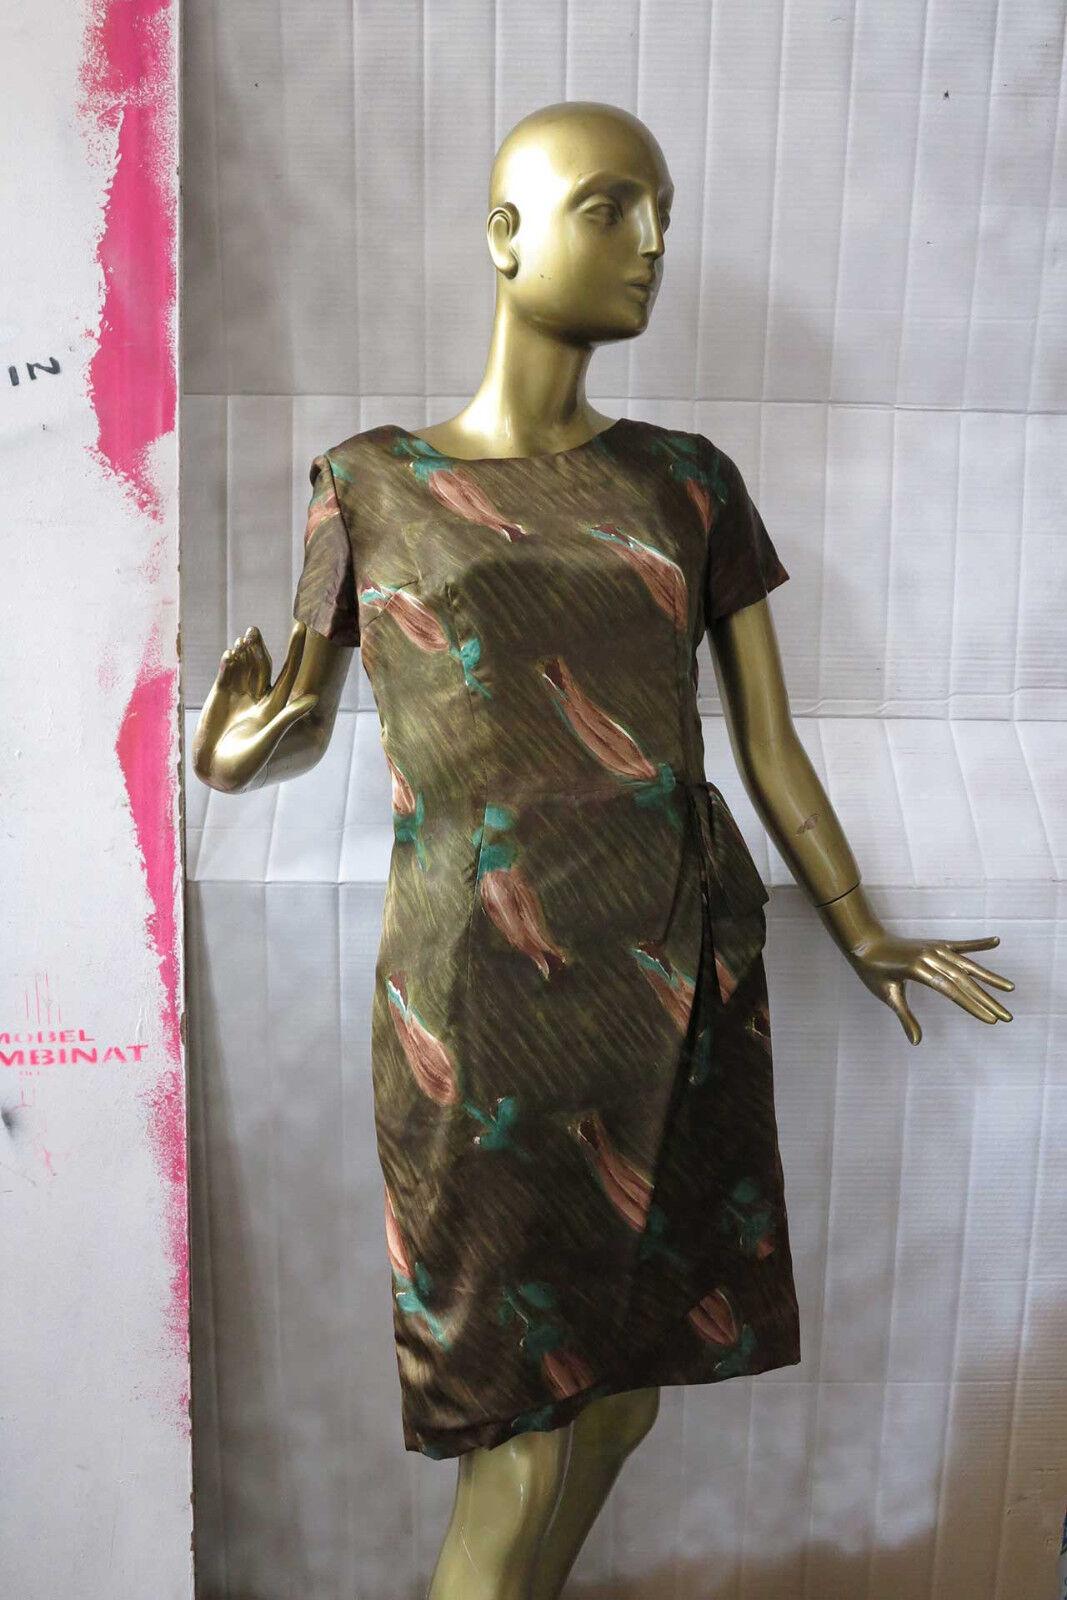 Exquisite Sommerkleid Blaumen Kleid Gr. 40 Floral TRUE VINTAGE 60s summer dress